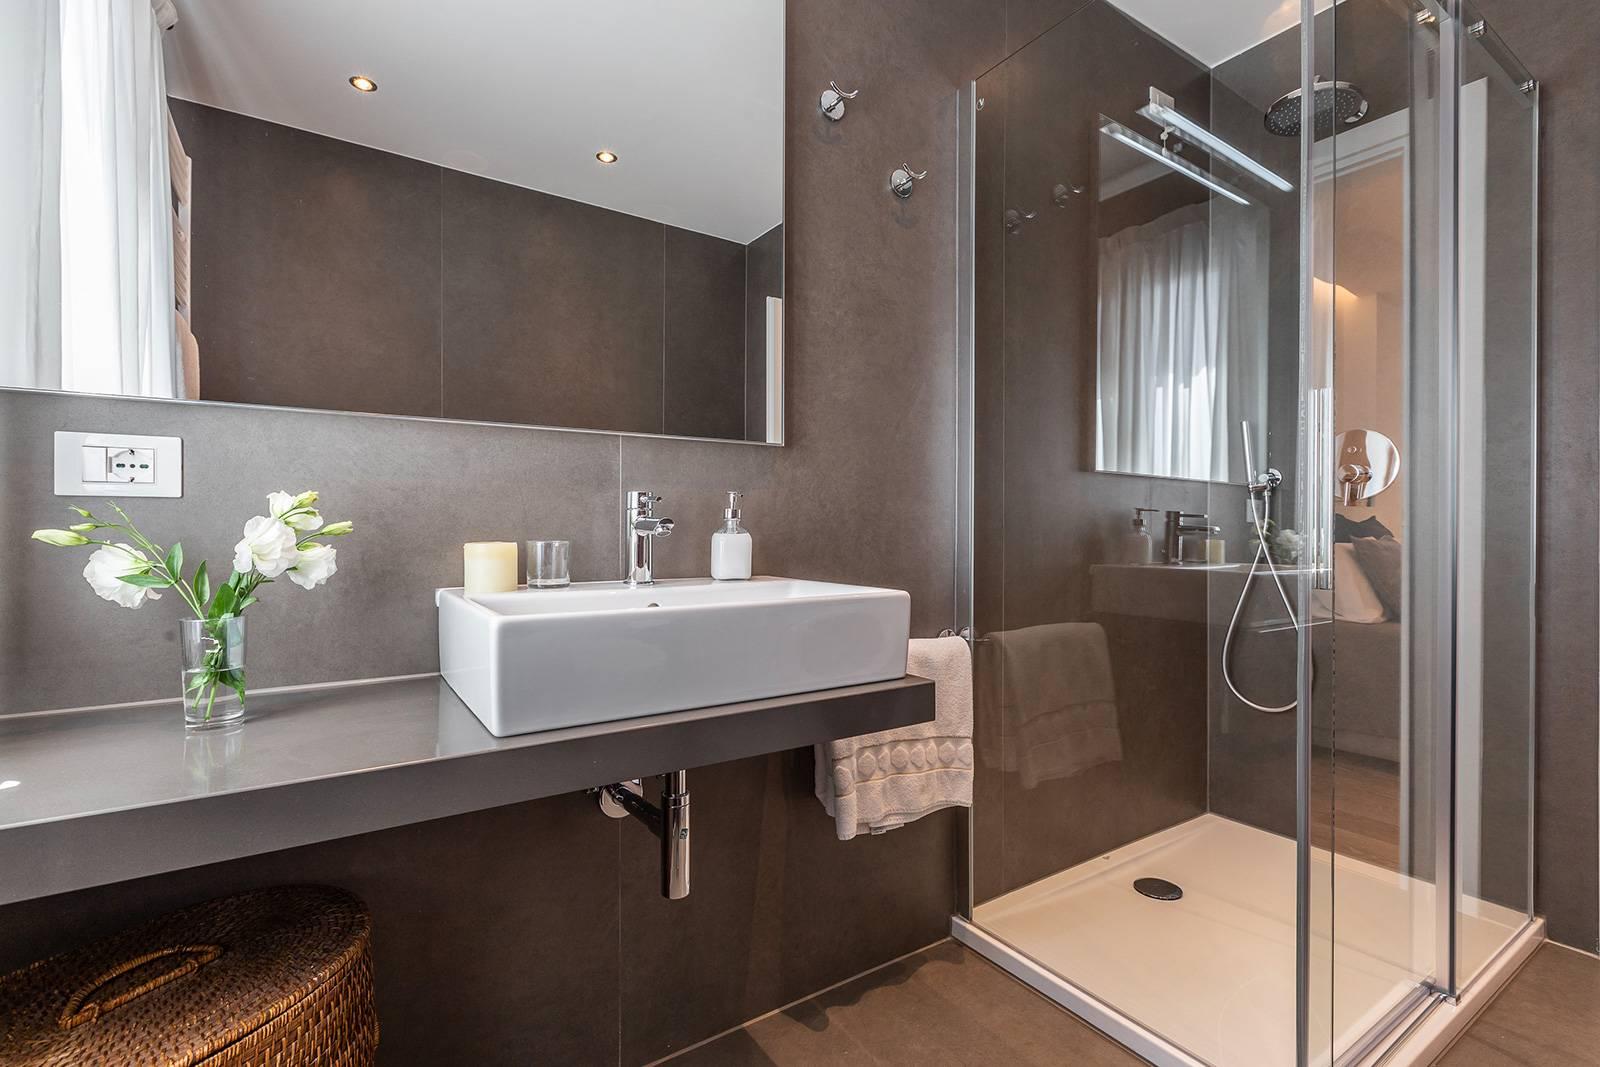 luxury en-suite bathroom with large shower cabin